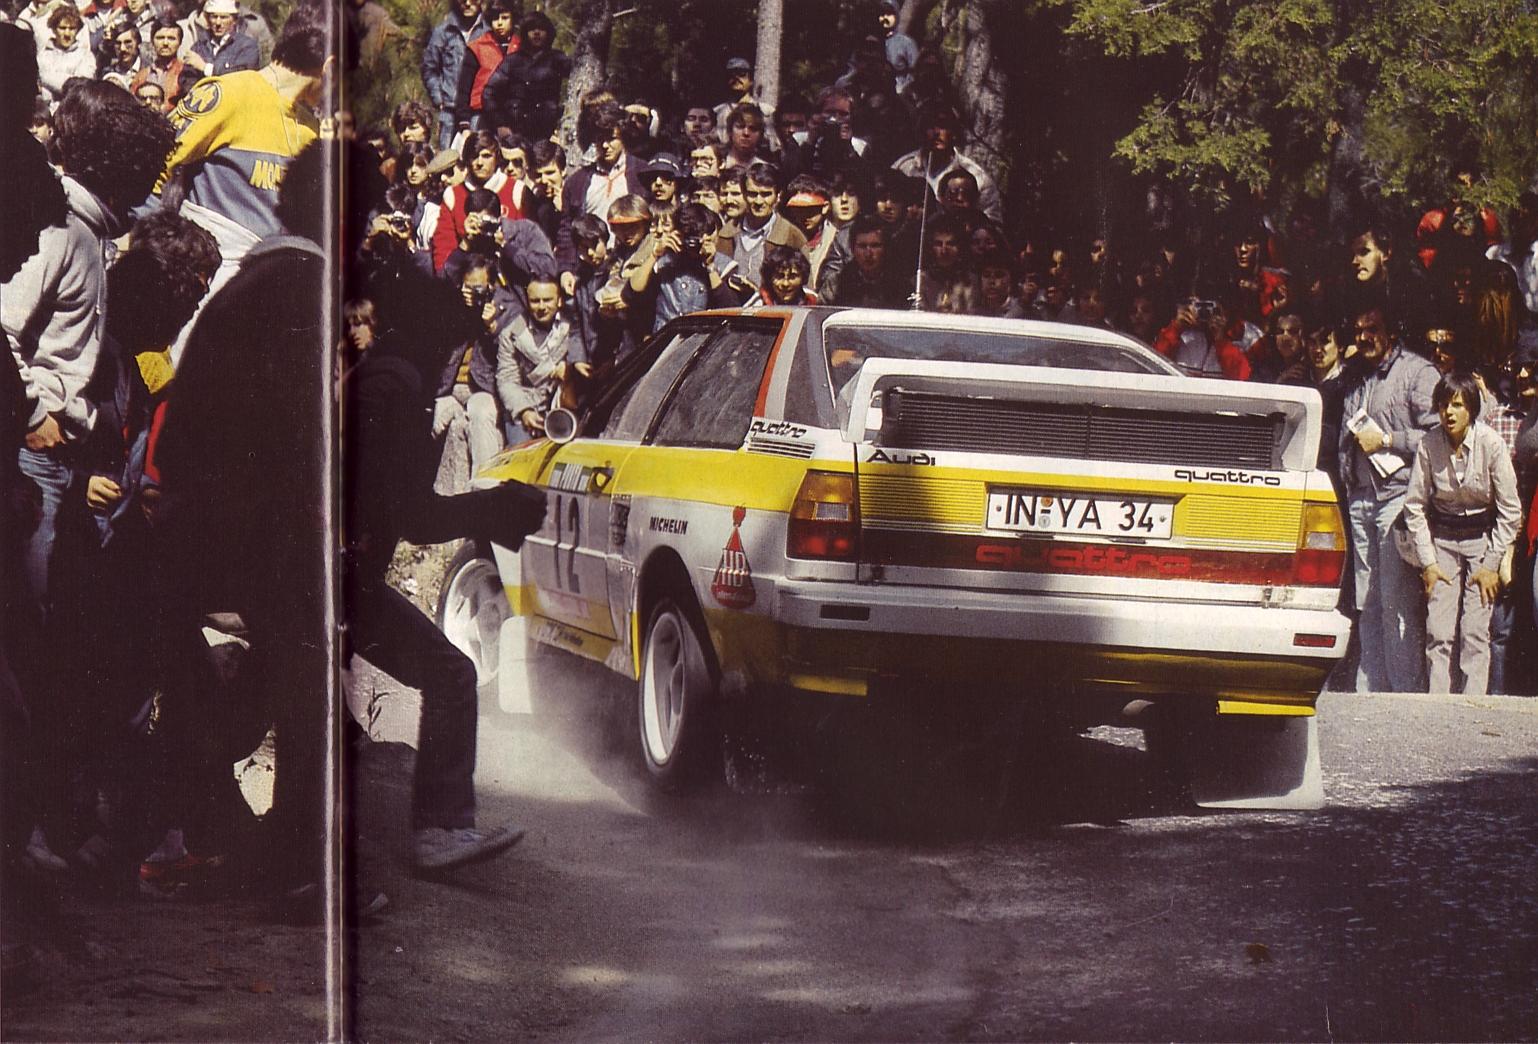 Lancia Delta Hf Turbo V also Ferrari Gtb Group B Rally Car Heading To Auction Photo Gallery likewise Lancia Hf A Cf furthermore Lancia Hf D B besides Portugal Rally Audi Quattro. on lancia delta rally car